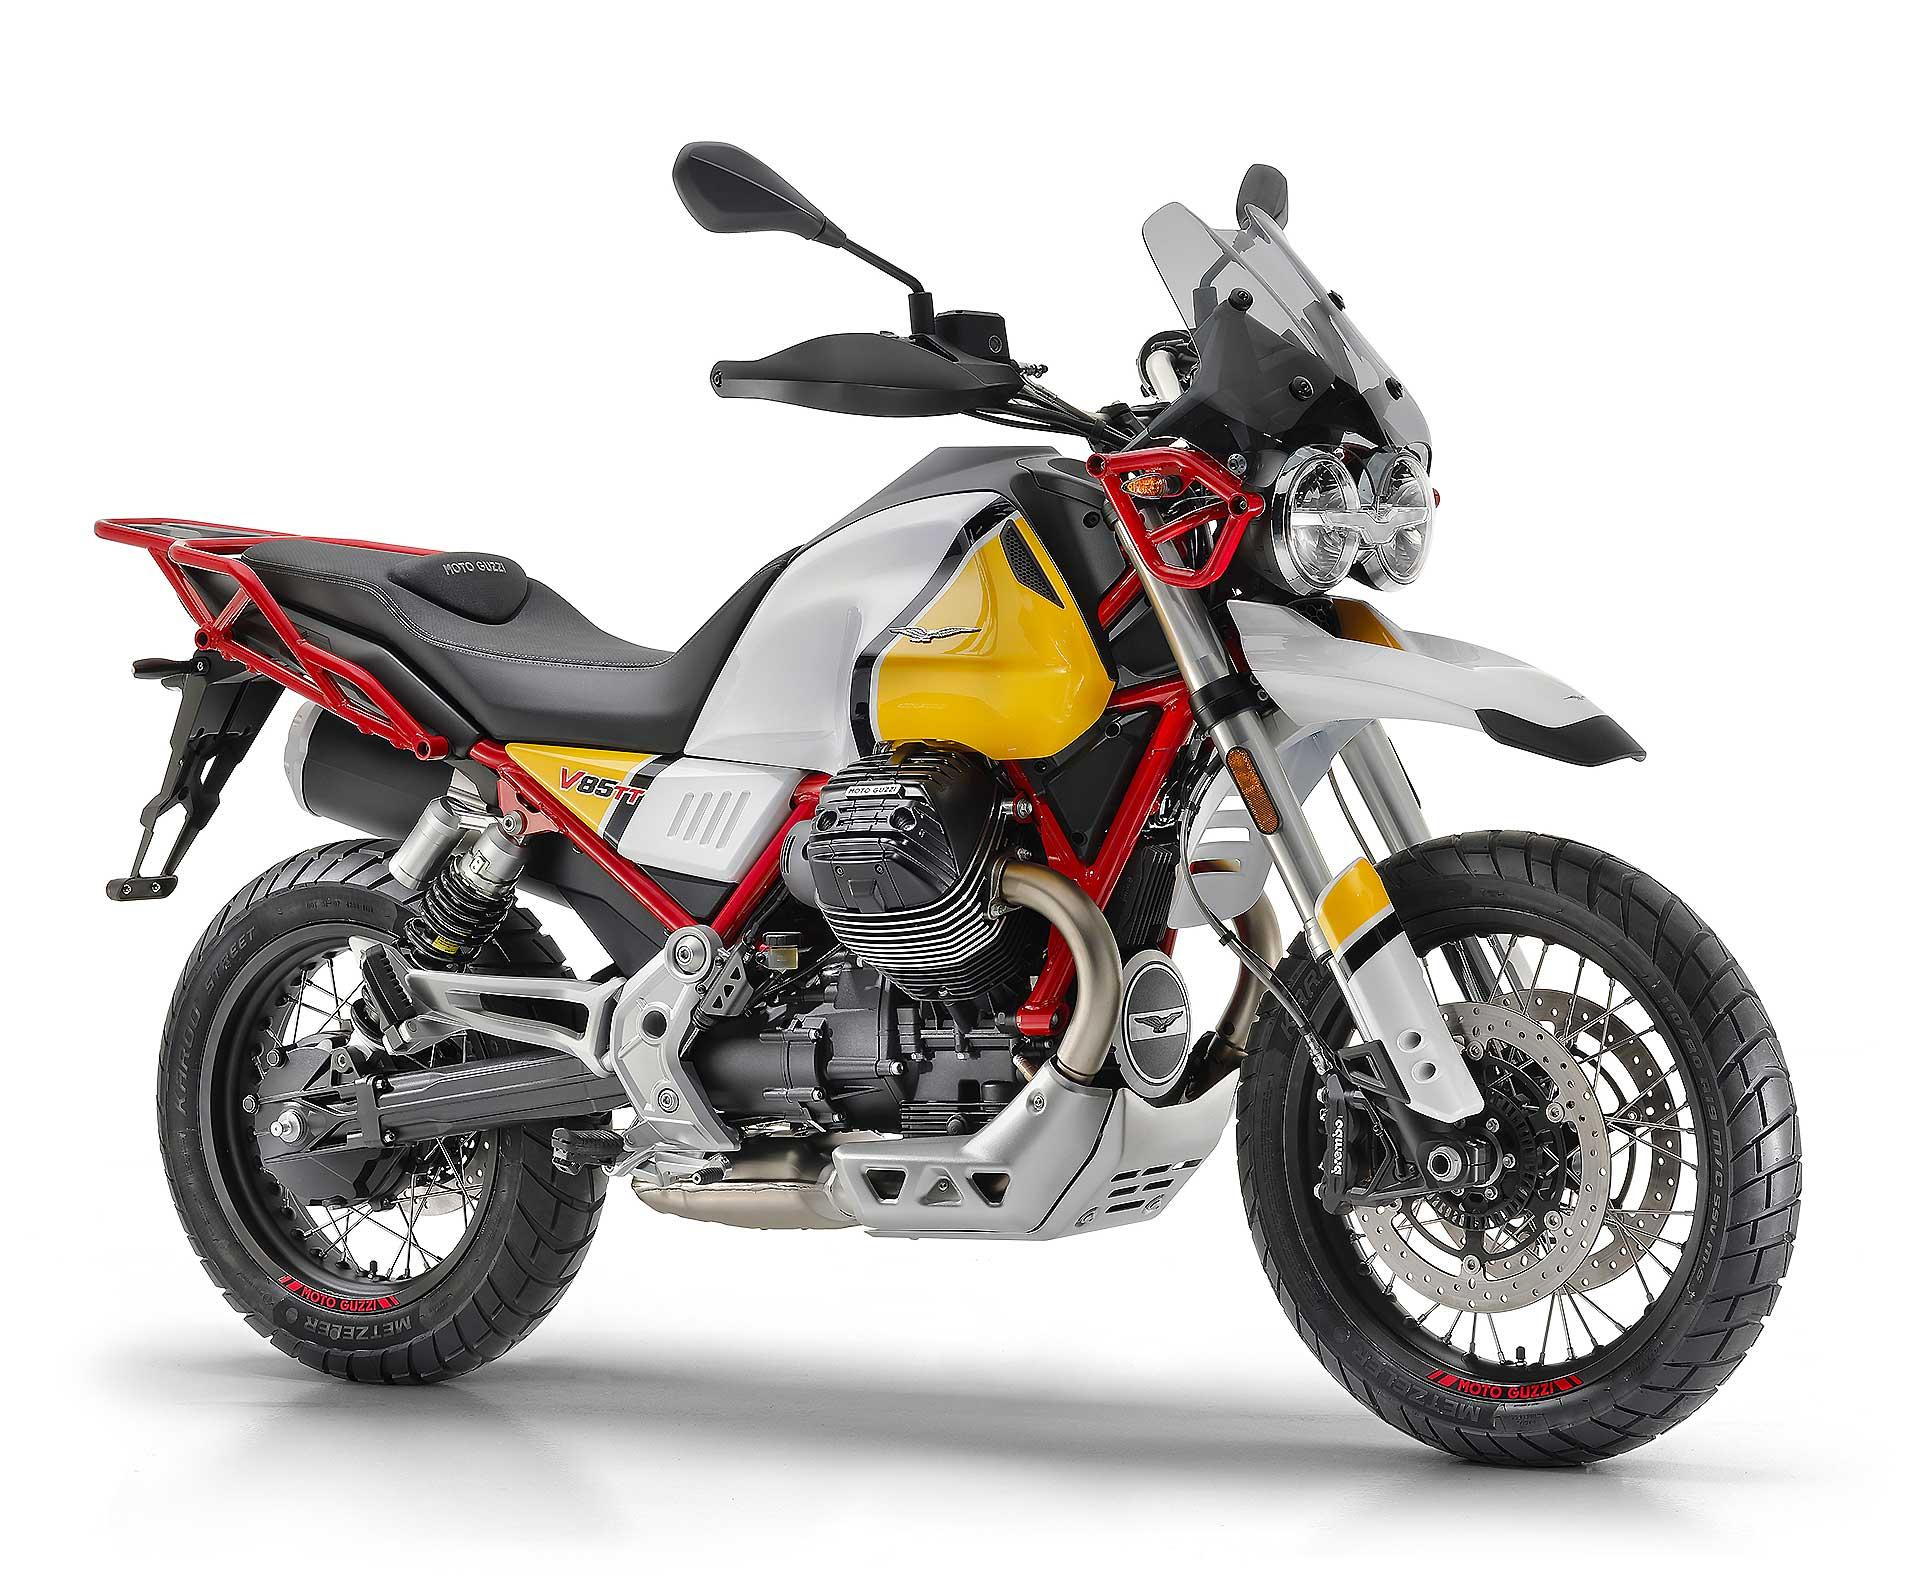 Moto Guzzi V85 TT gialla e rossa 3/4 anteriore fondo bianco